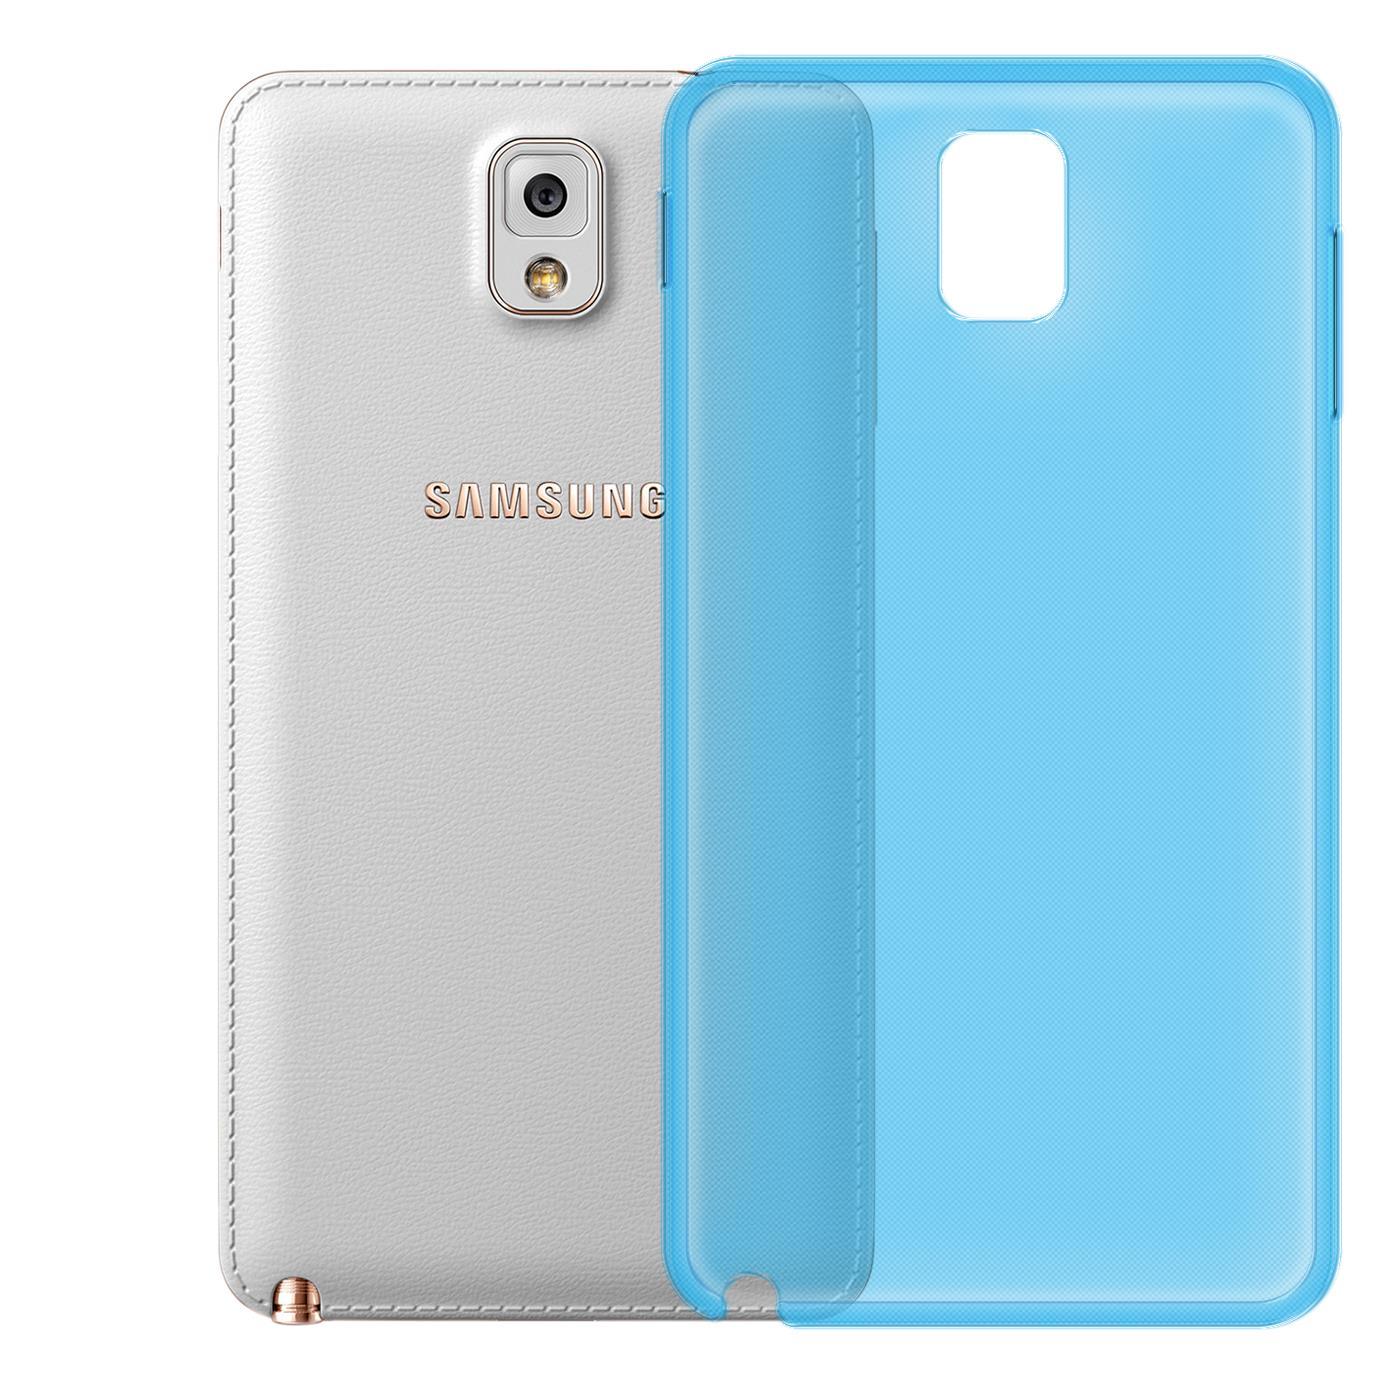 Samsung-Galaxy-Note-4-Thin-Silikon-Klar-Case-Cover-Ultra-Slim-Stossfeste-Gel Indexbild 8